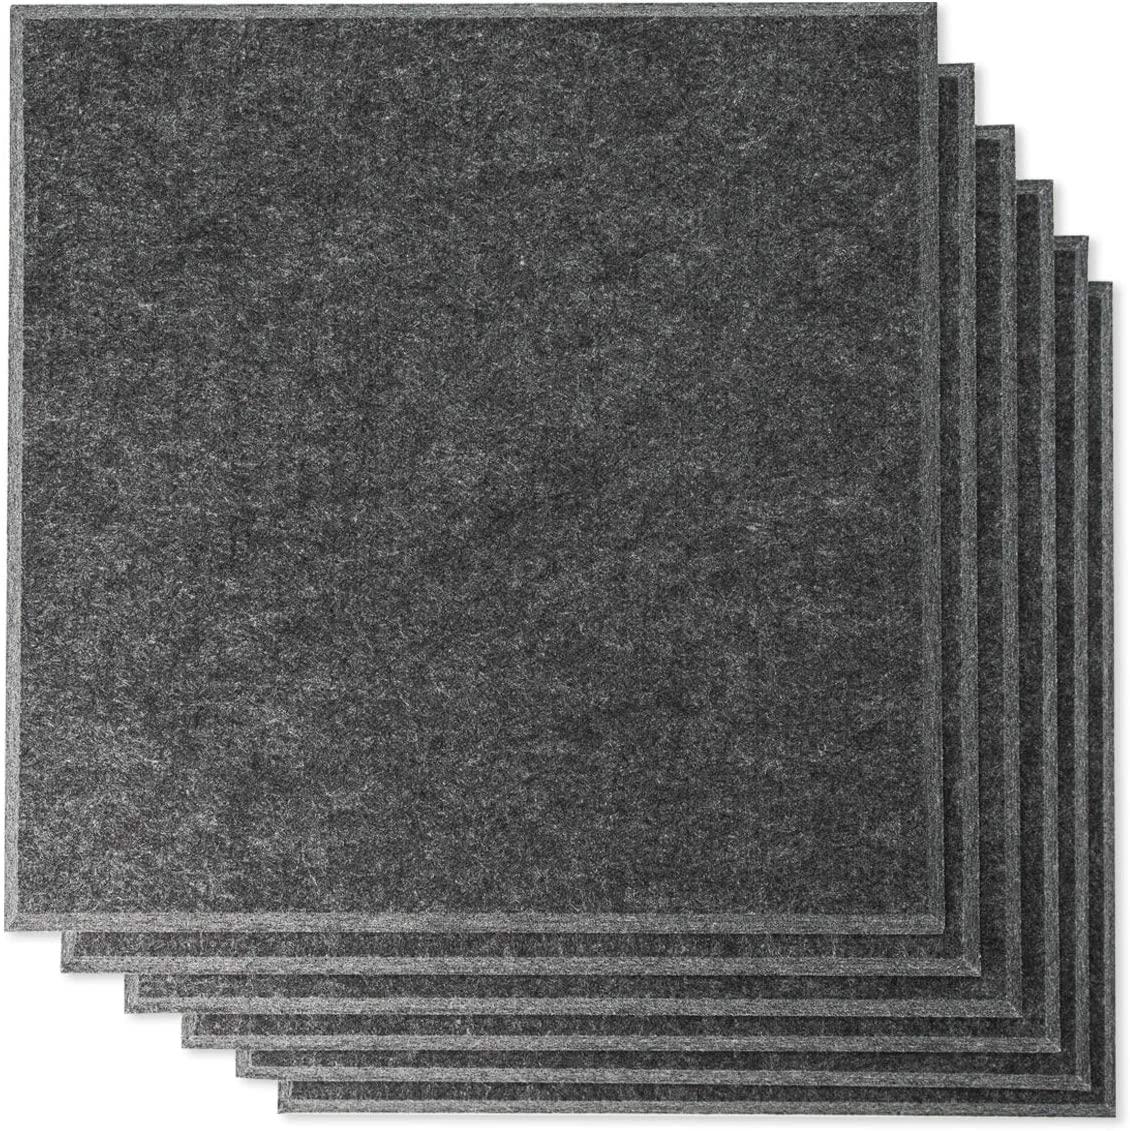 Rhino Acoustic Absorption Panel 12